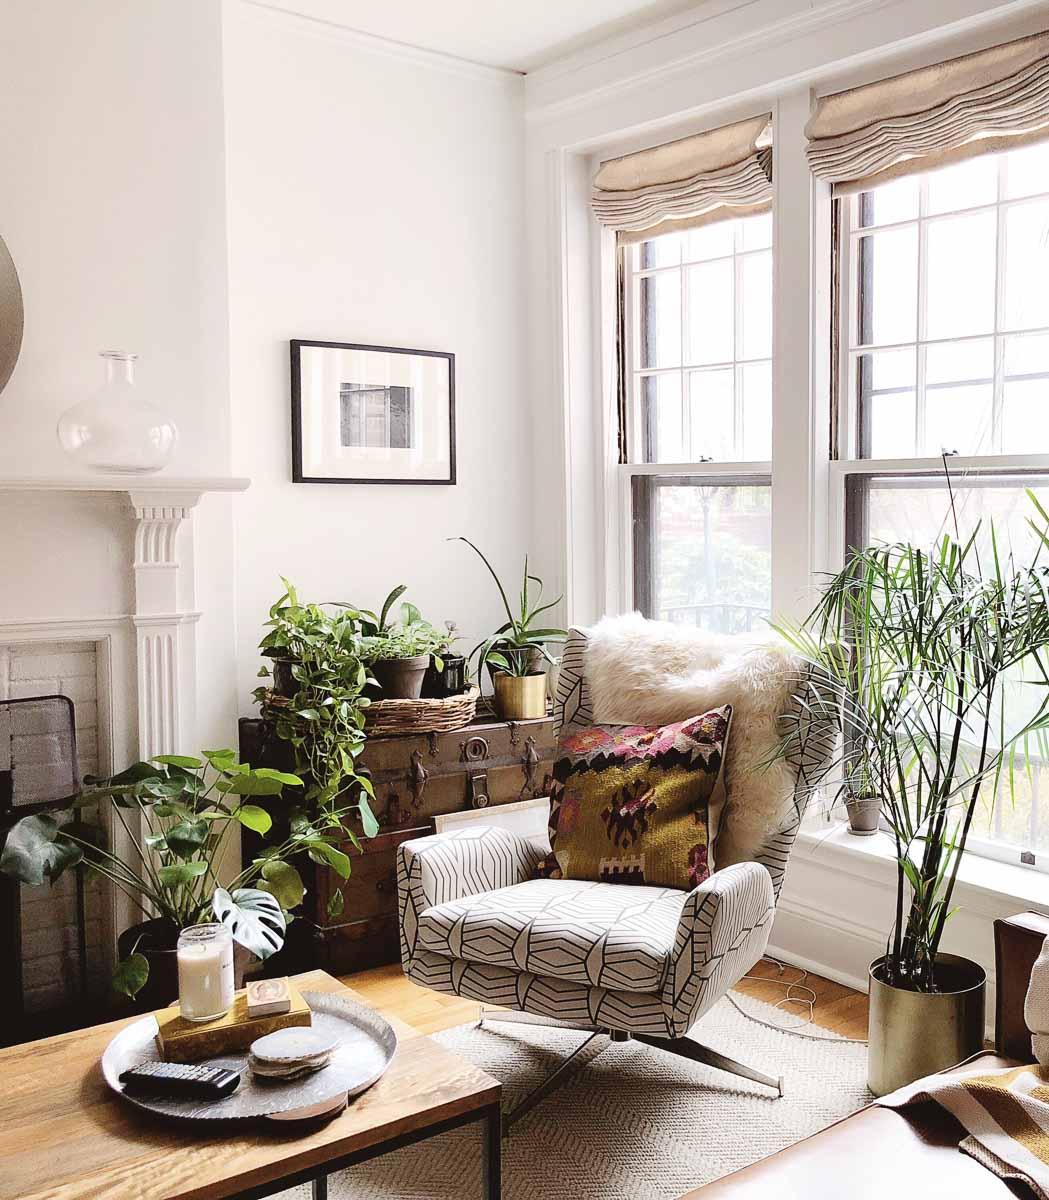 Boho-Charm-michigan-natural-light-photography-studio-lifestyle-photo-ideas-indoor-photoshoot-location-9.jpg